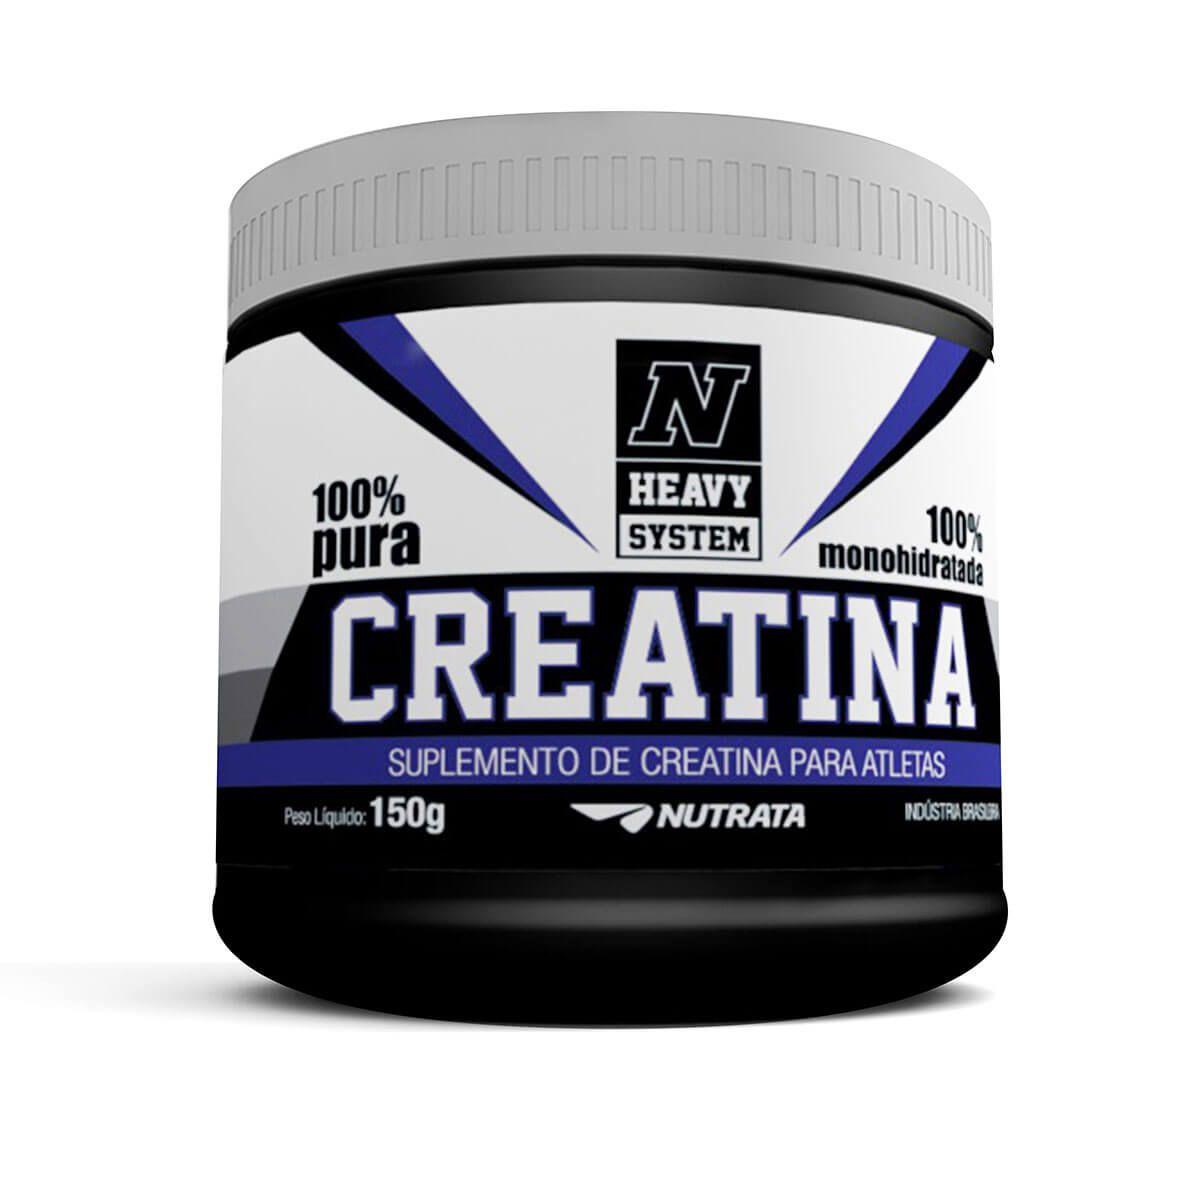 Creatina 100% Pura Nutrata - 150g